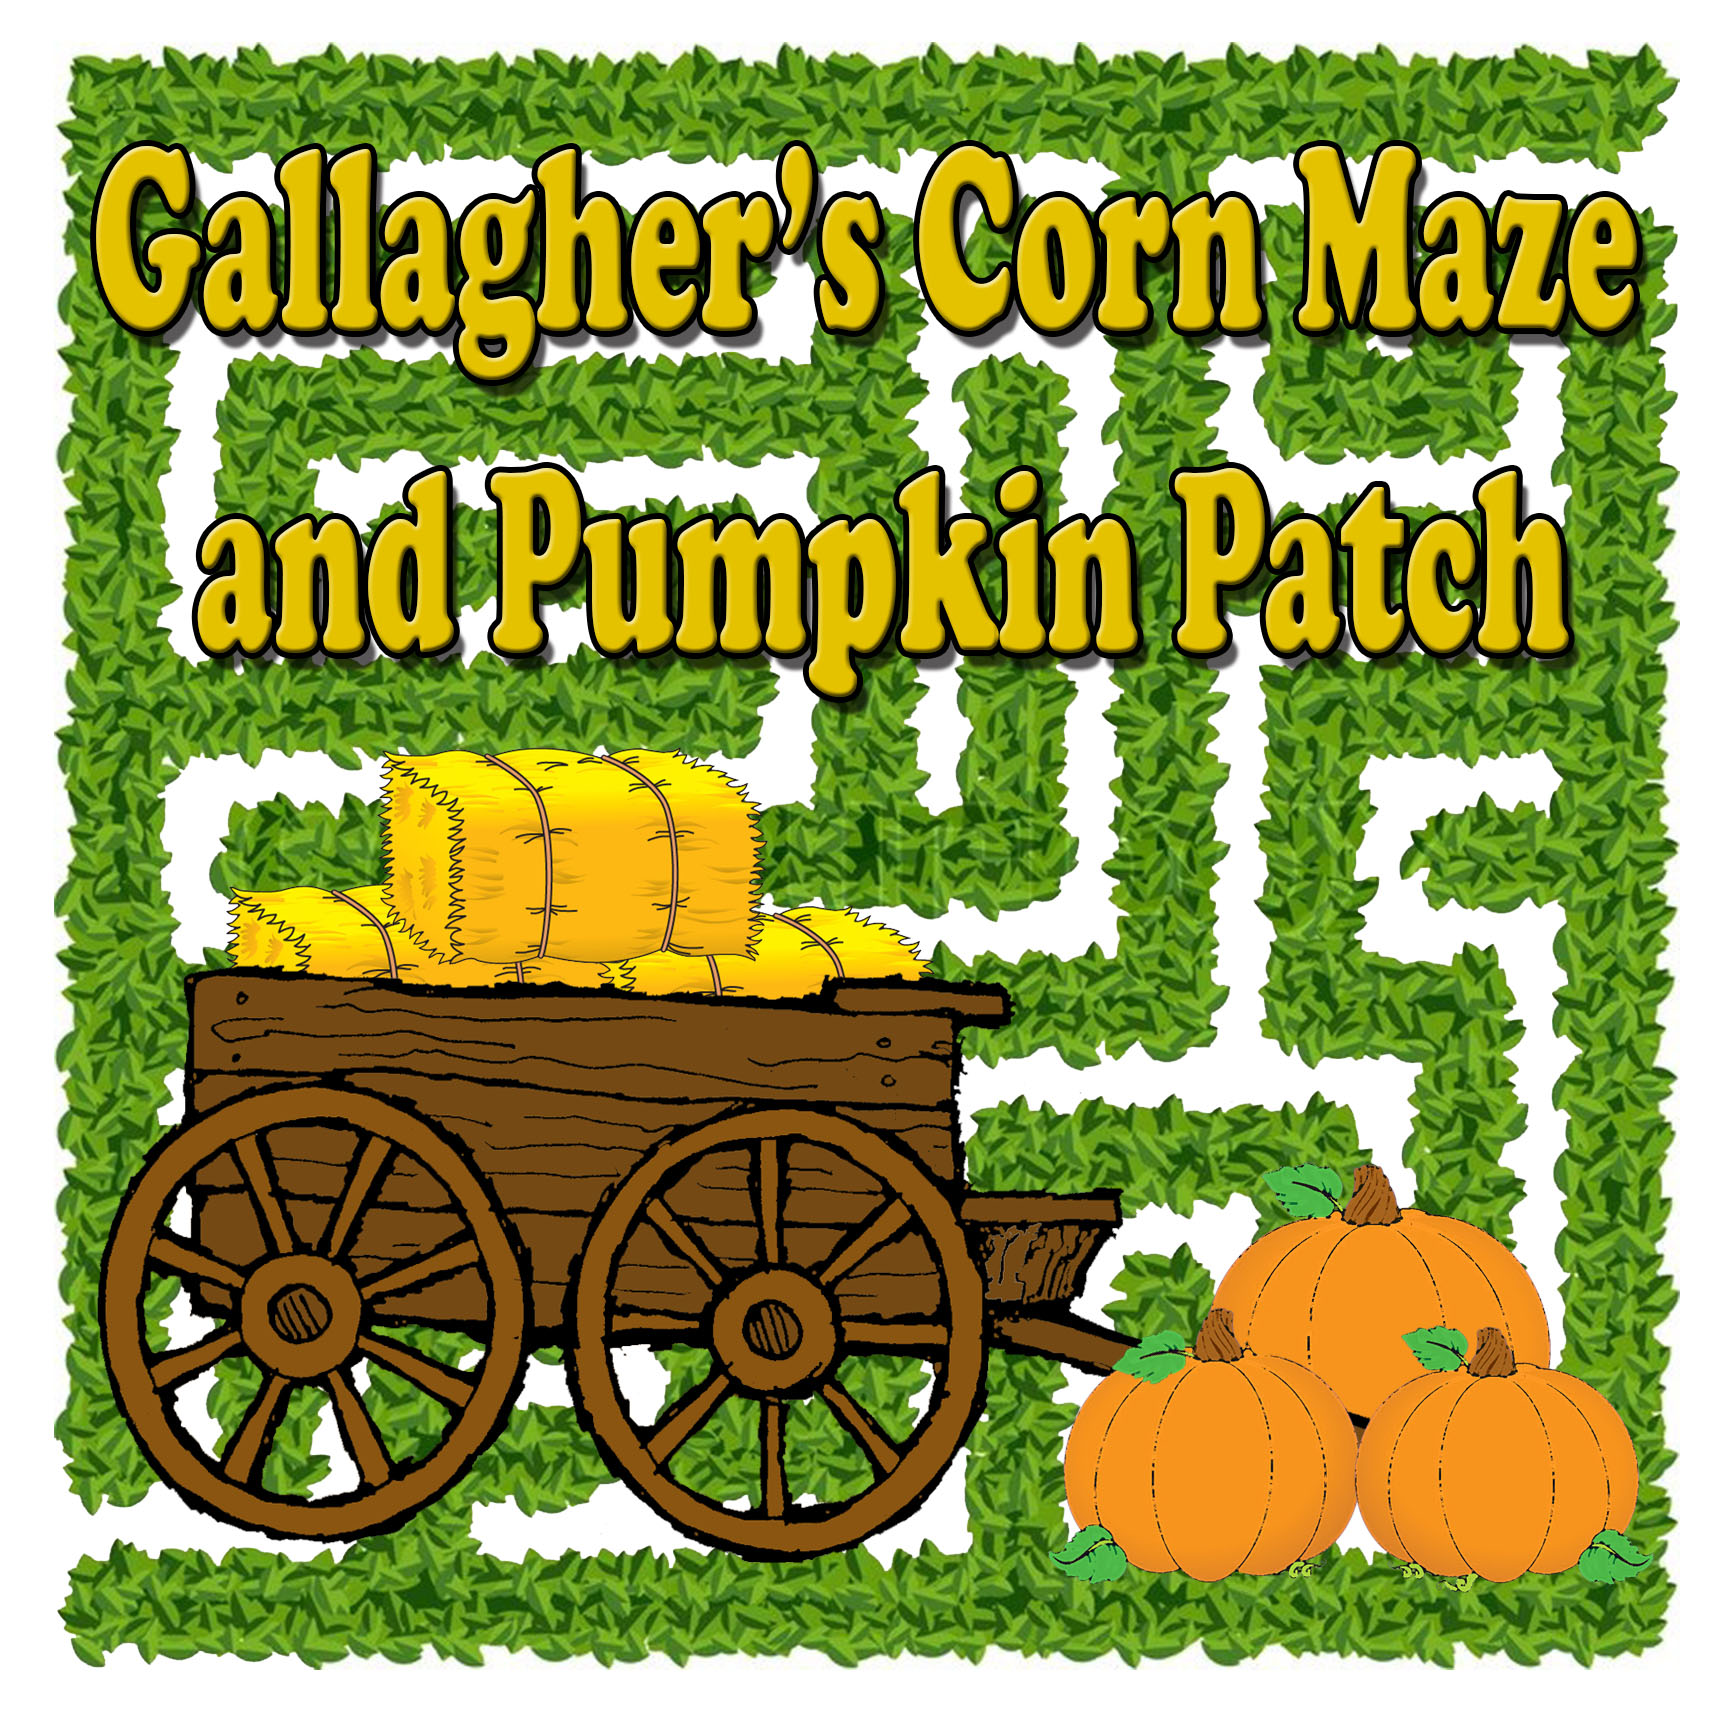 Gallagher's Corn Maze.